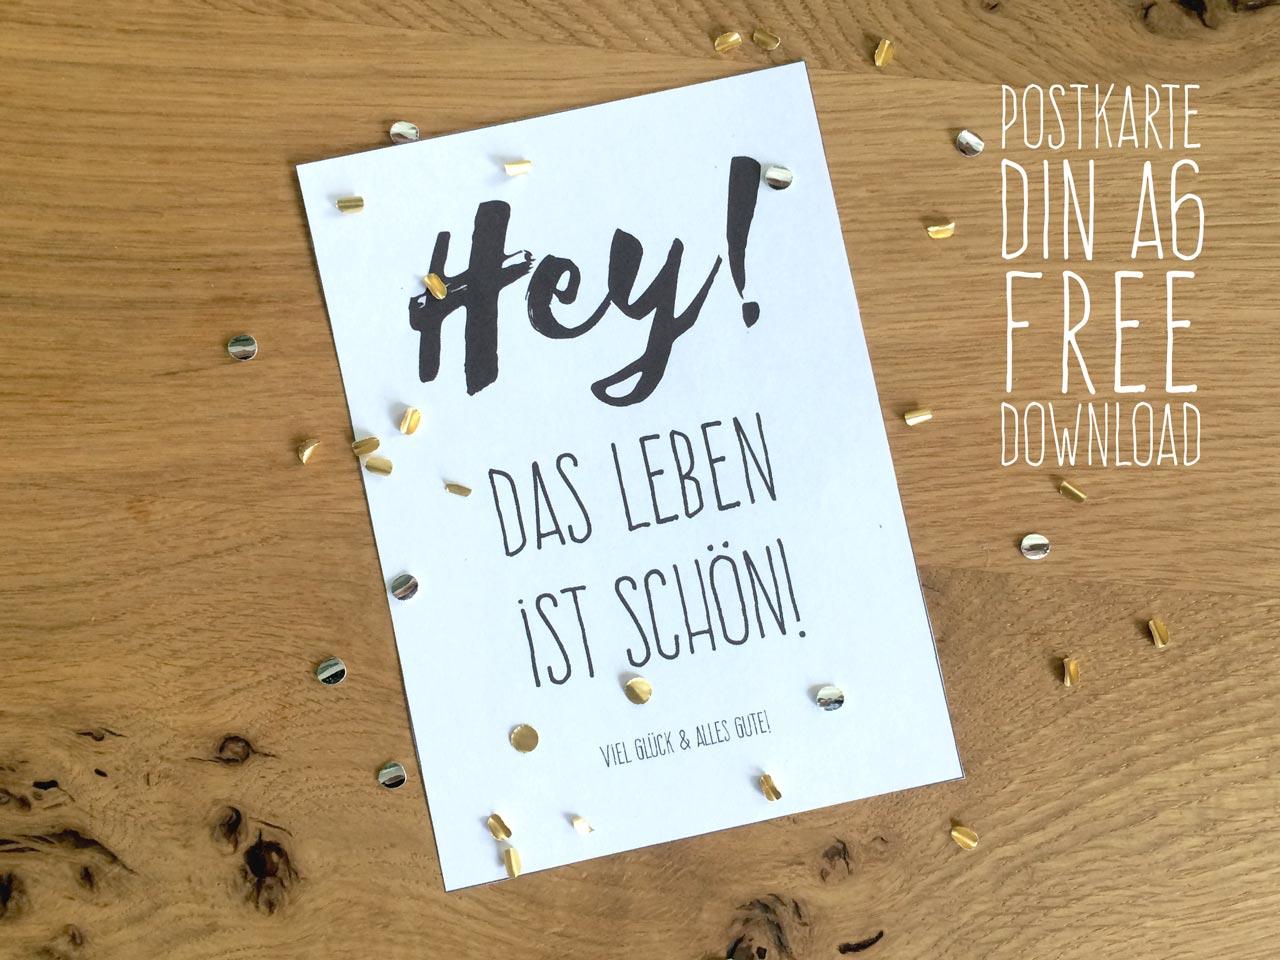 DIN A6 Postkarte free Download